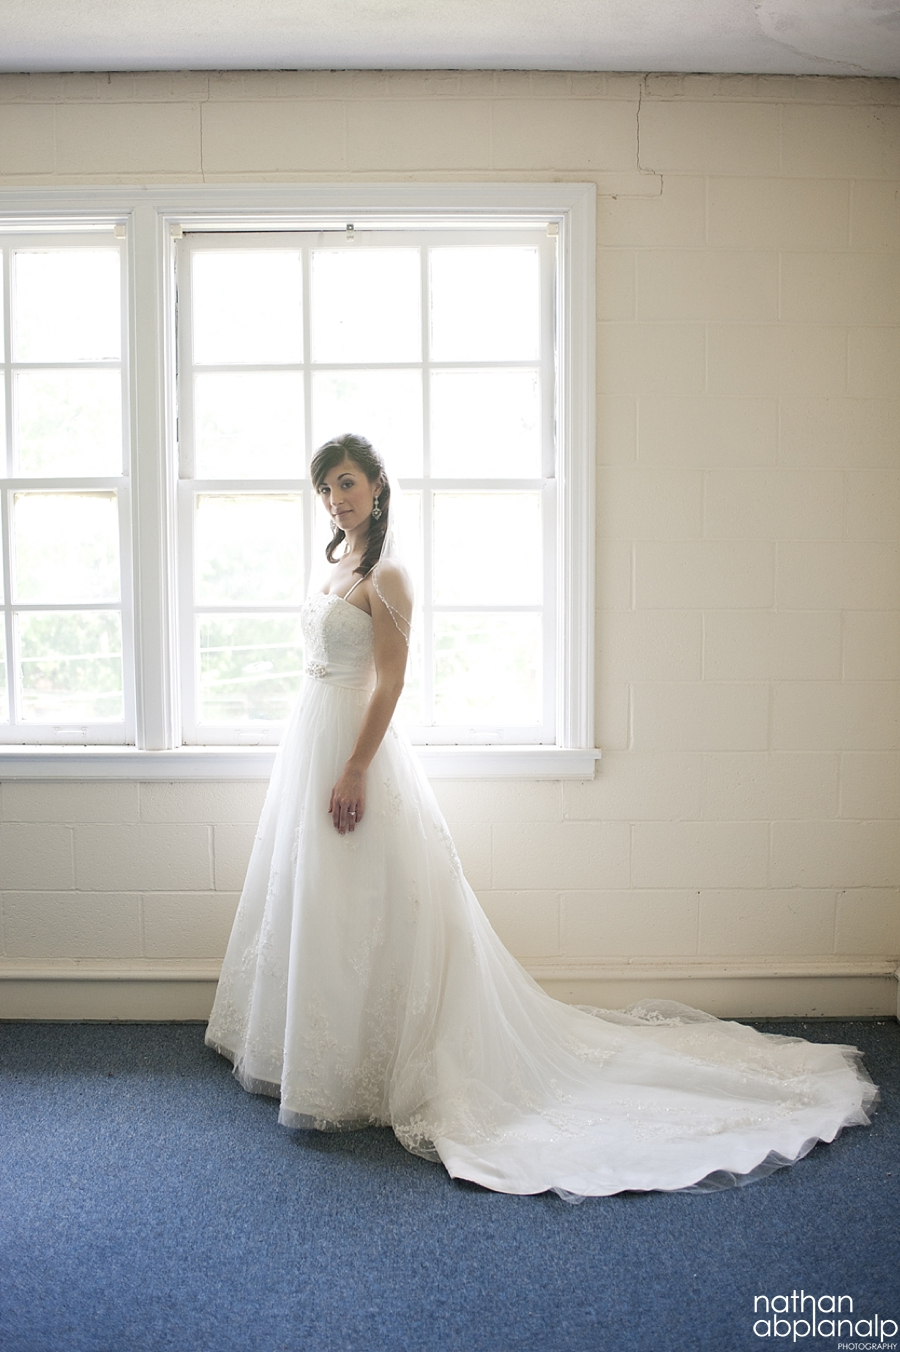 Nathan Abplanalp - Charlotte Wedding Photographer (21)